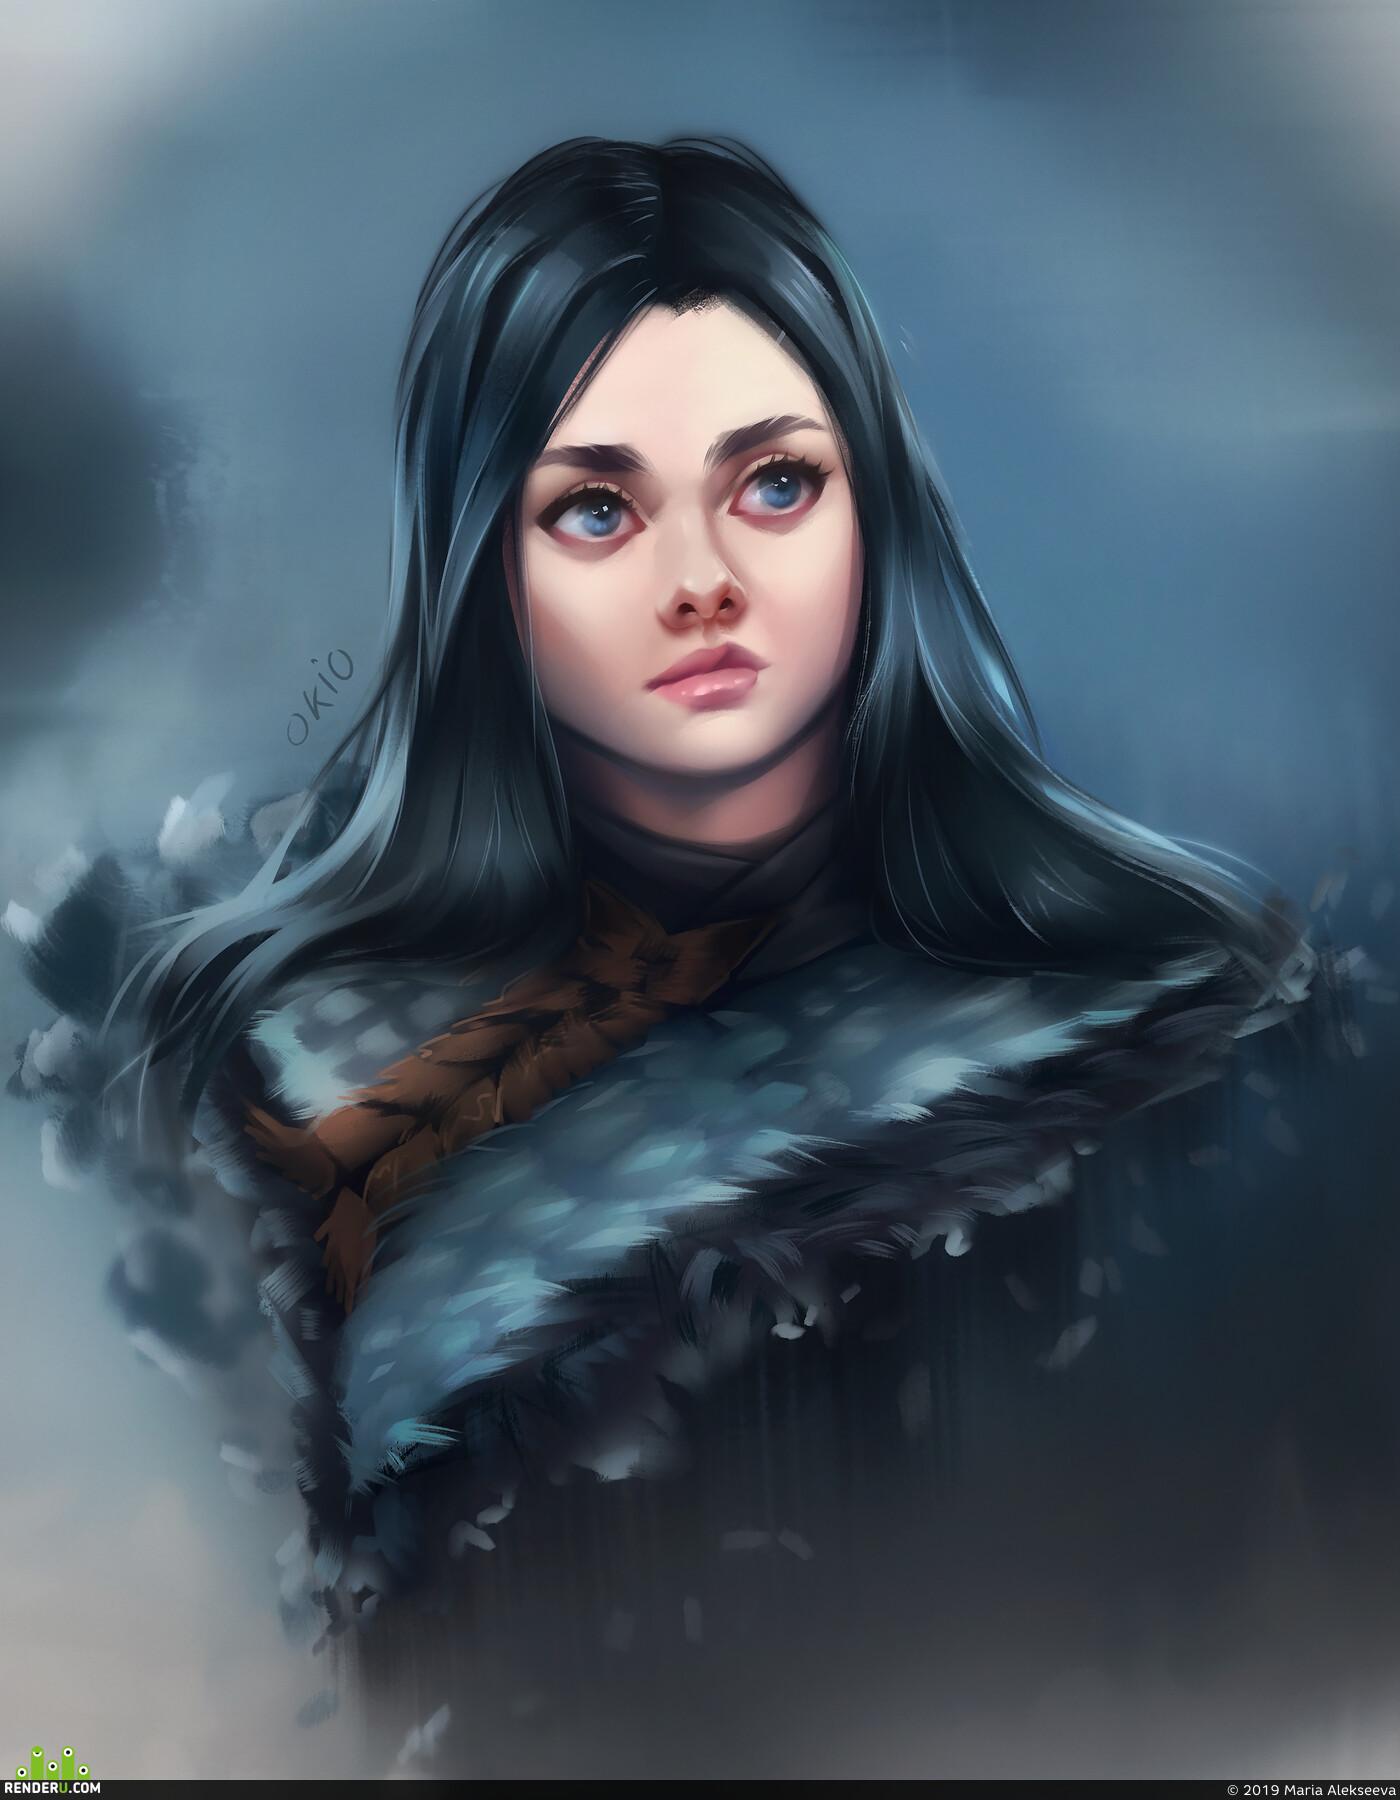 gameofthrones, Winterfell, game, thrones, arya_stark, aryastark, arya, stark, Portrait